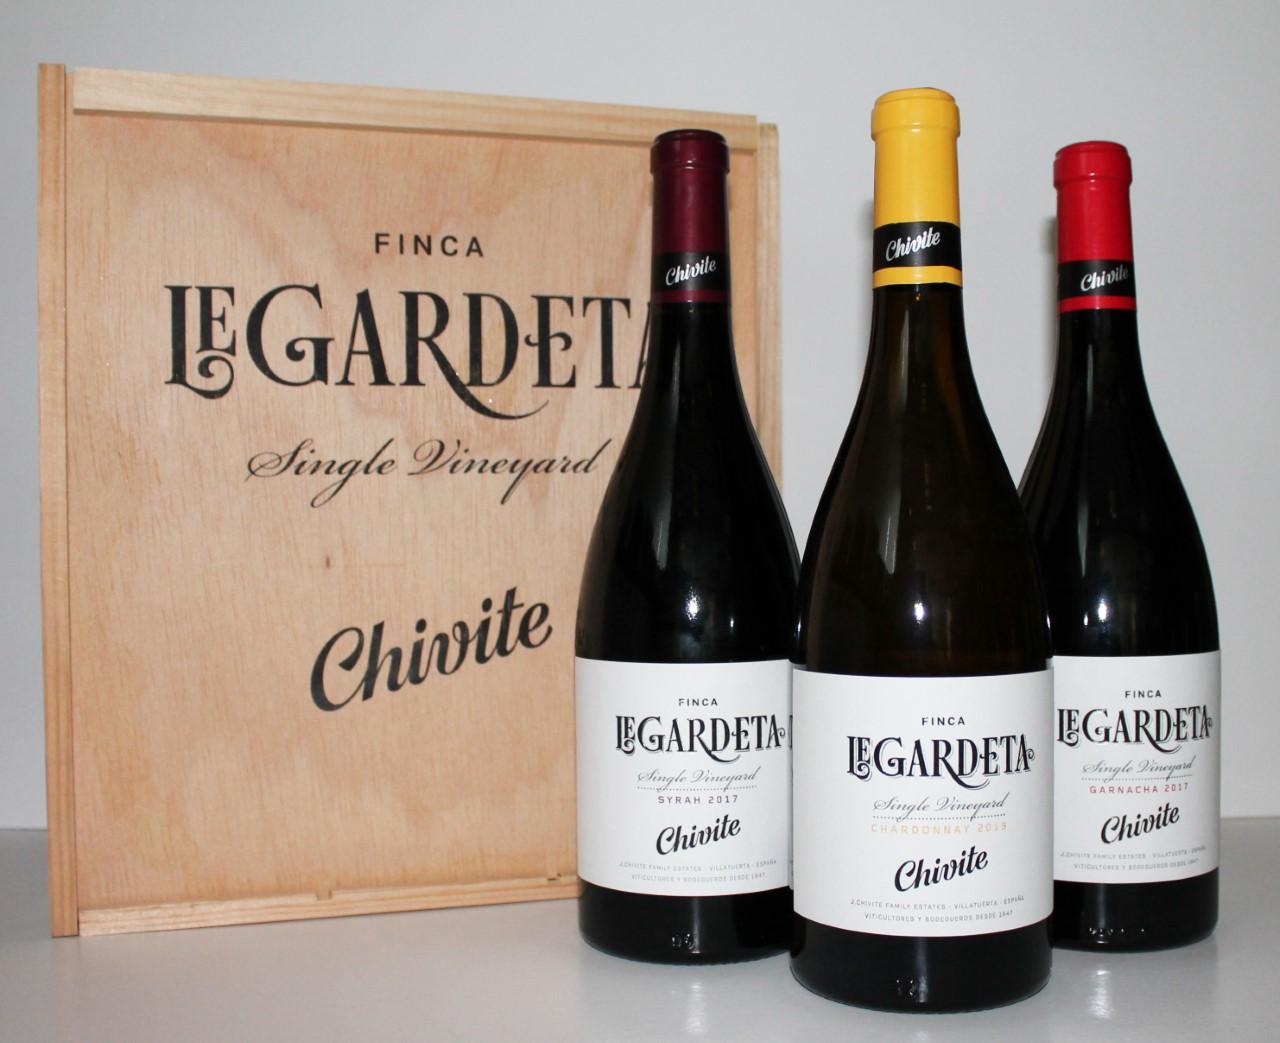 Nuevos vinos monovarietales de Chivite nacidos en la Finca de Legardeta